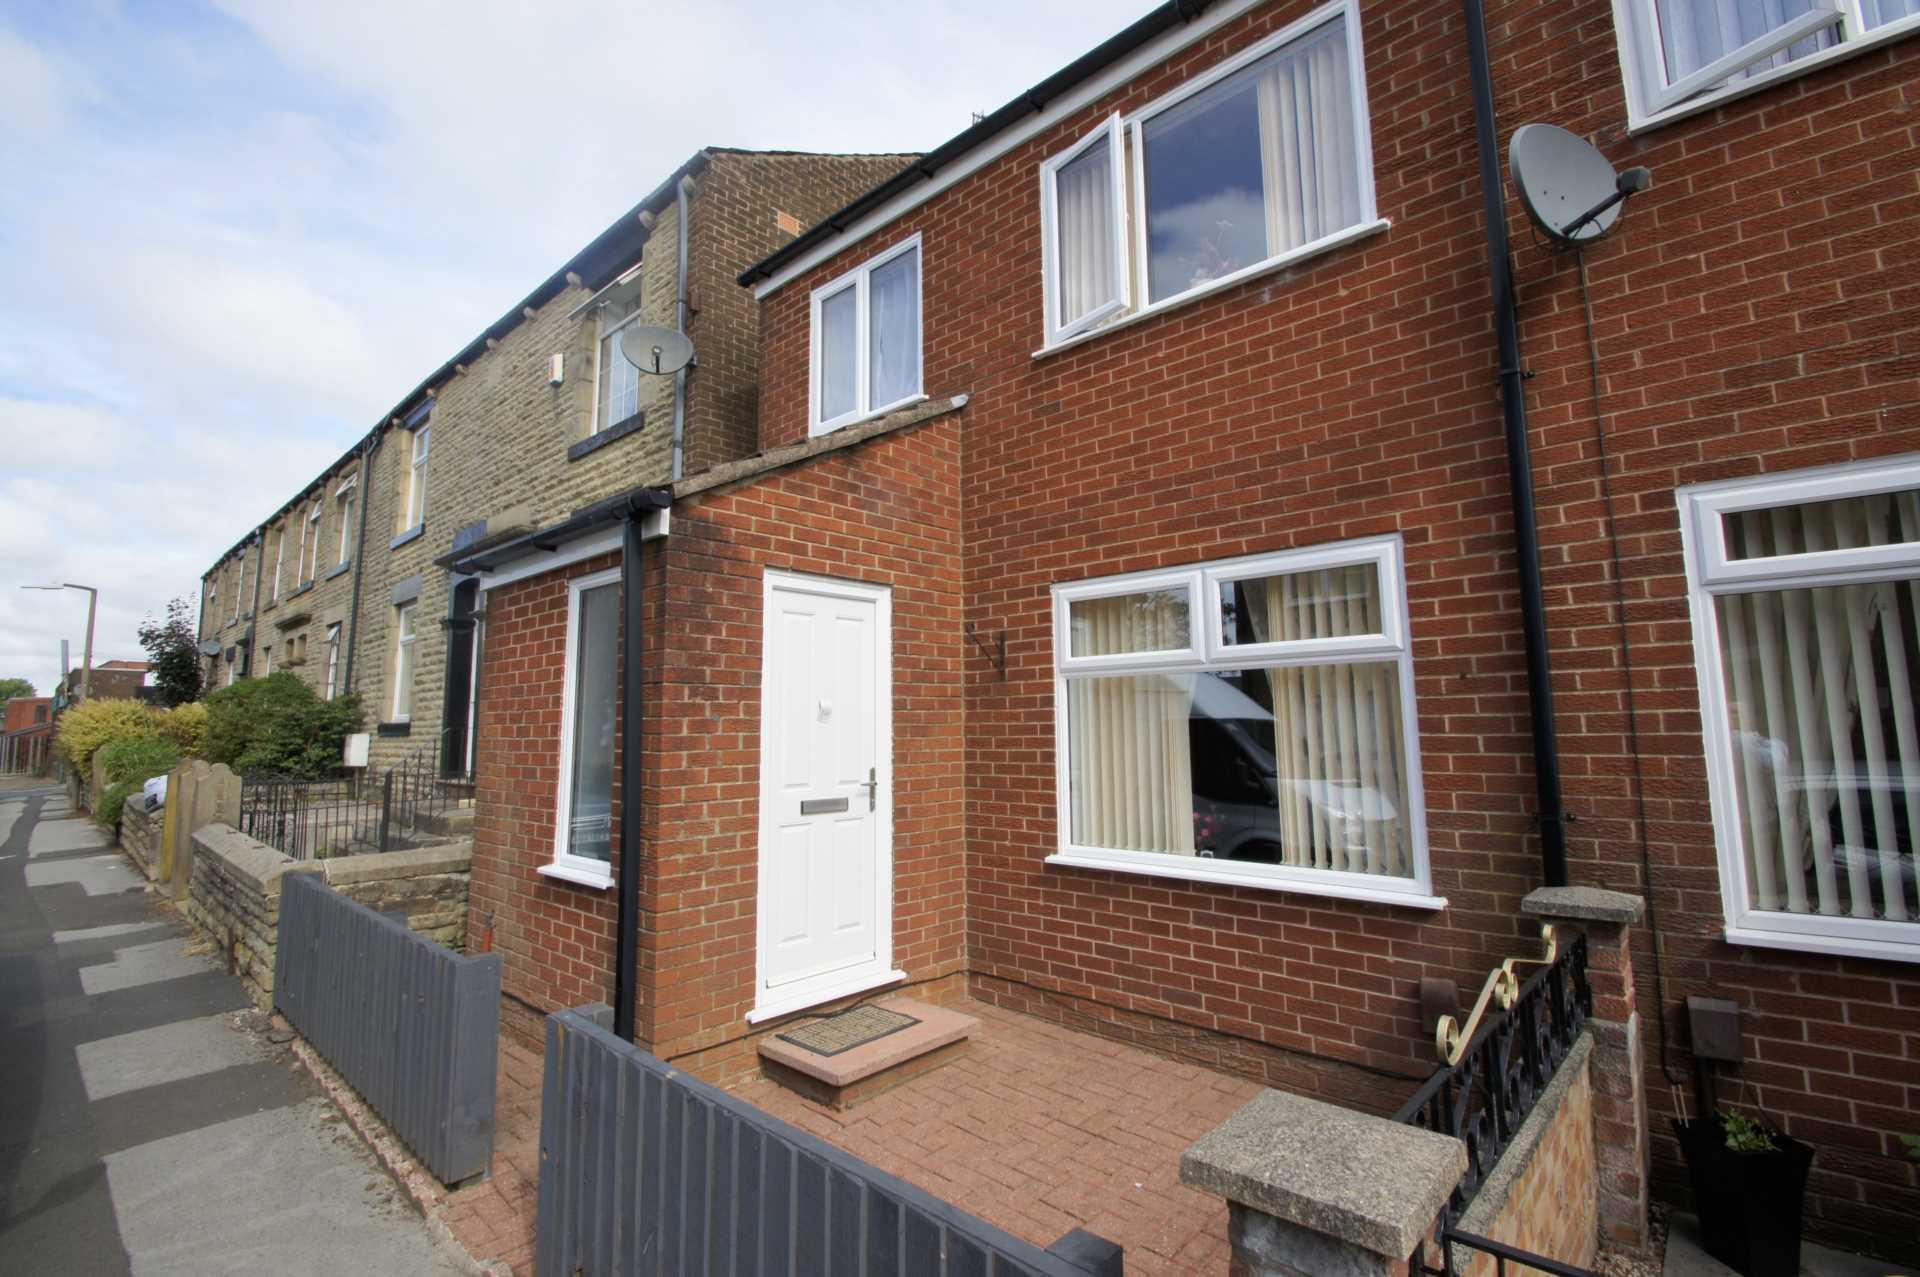 Redman Casey Estate Agency - 3 Bedroom Town House, Wright Street, Horwich